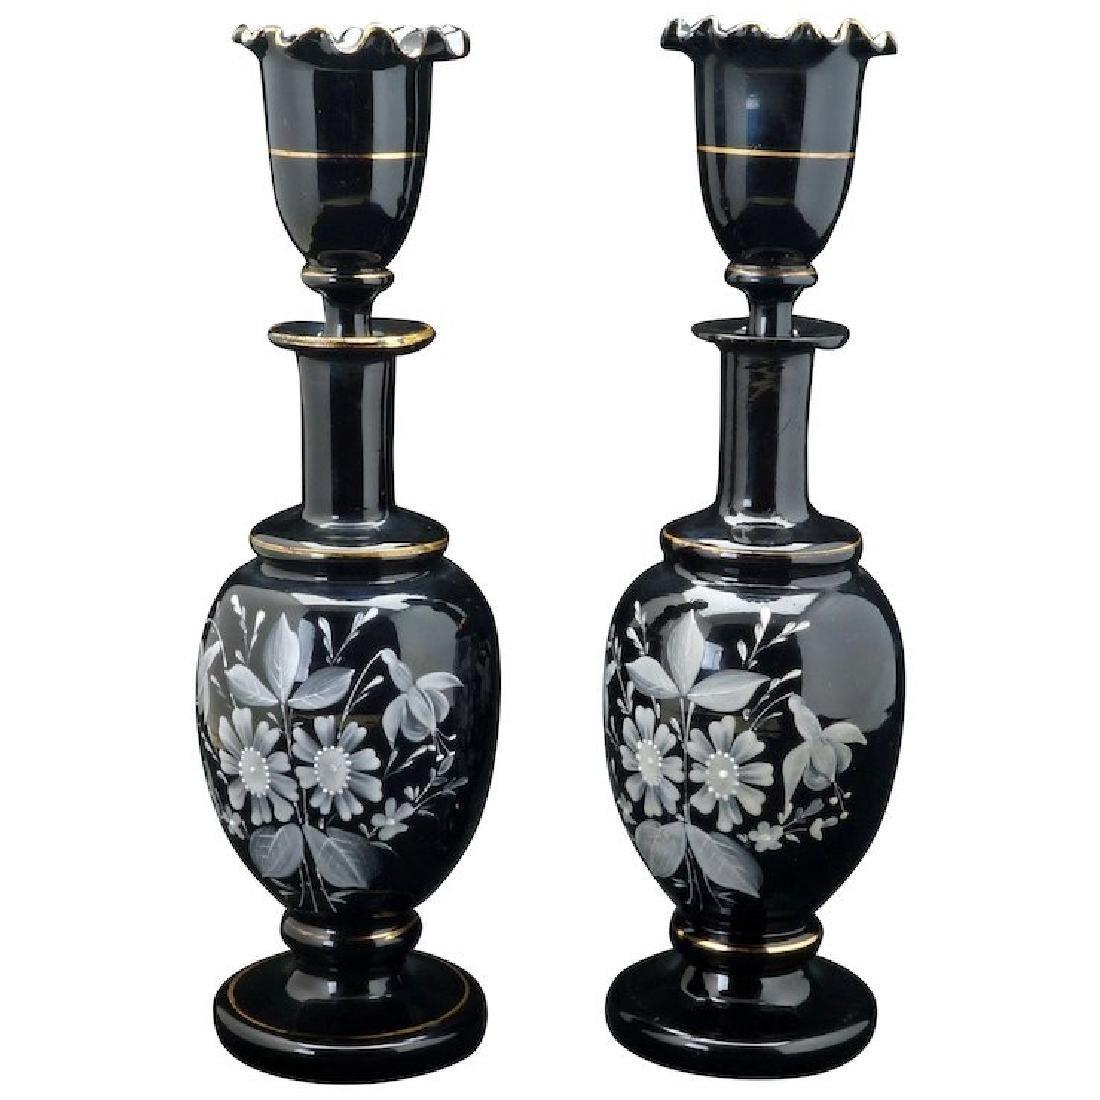 Pair of matching Victorian Bristol amethyst glass